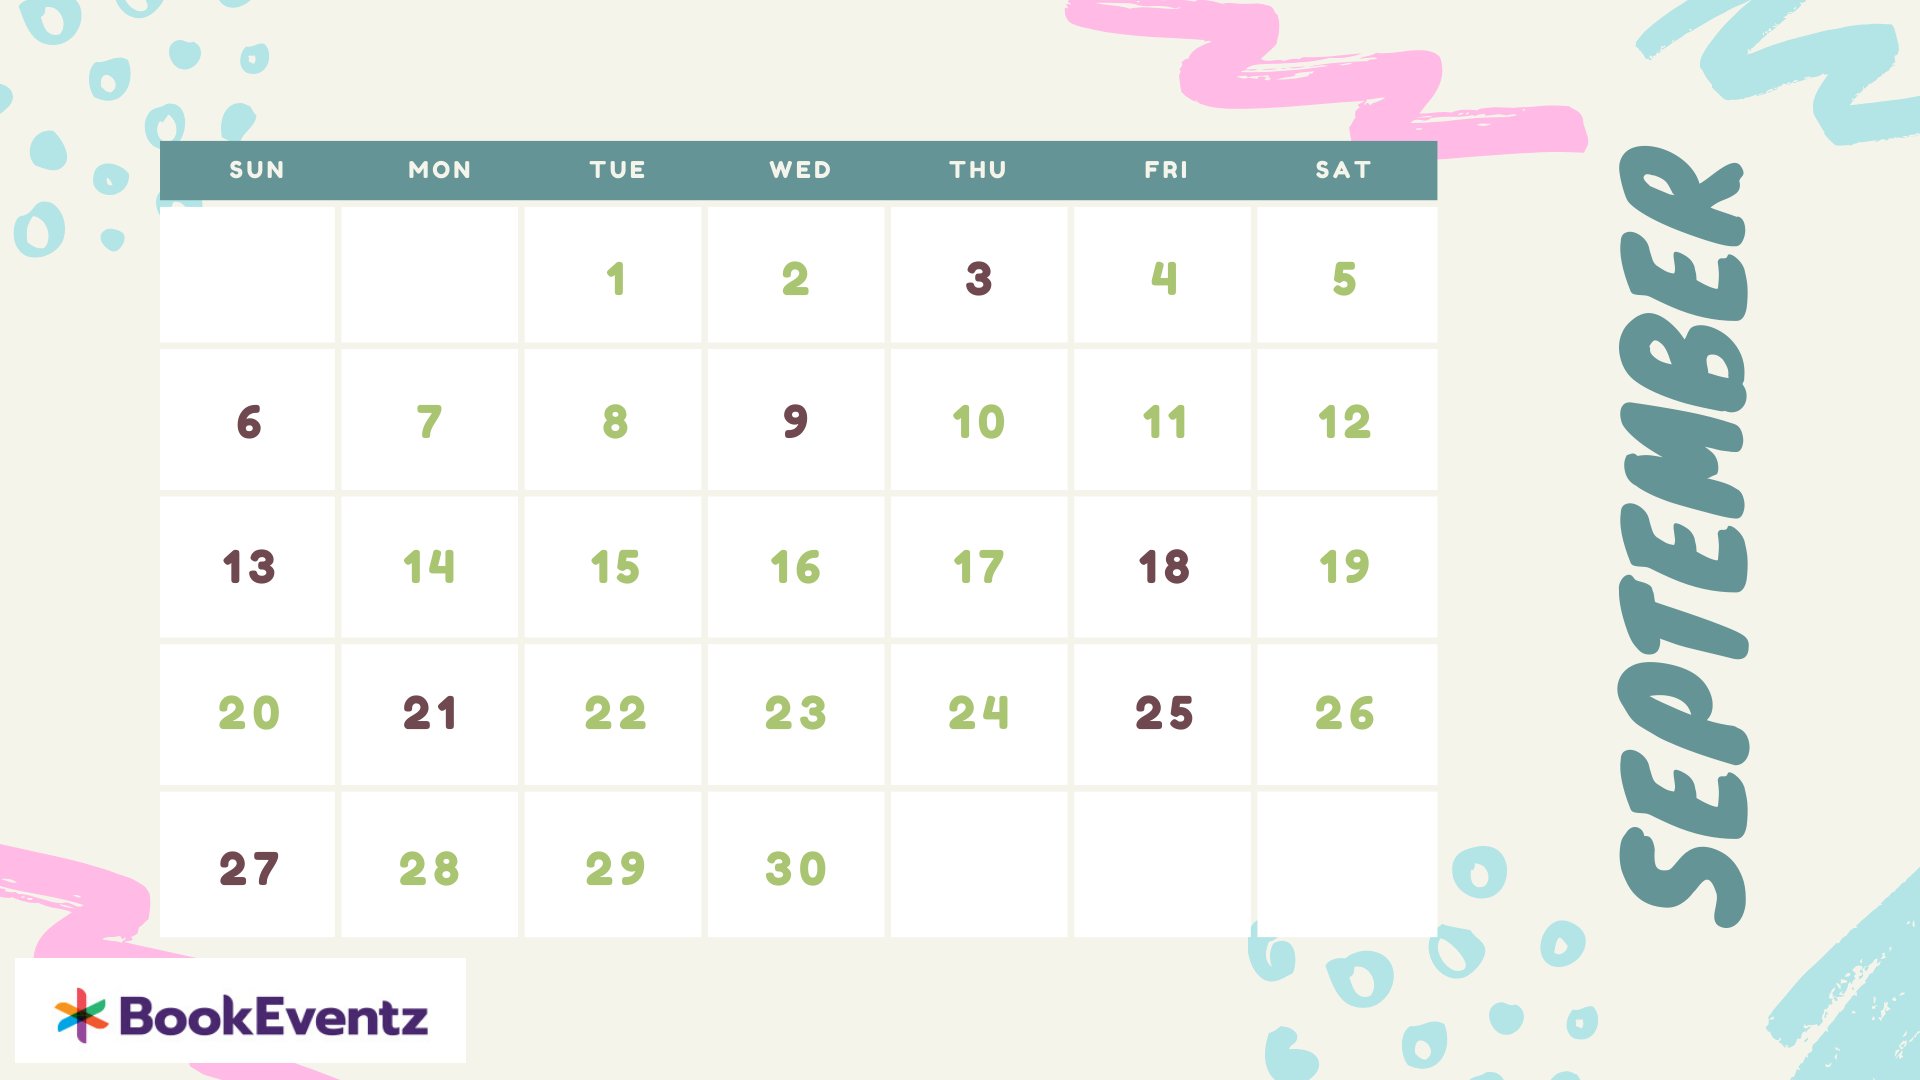 September Namkaran Muhurat Dates 2020